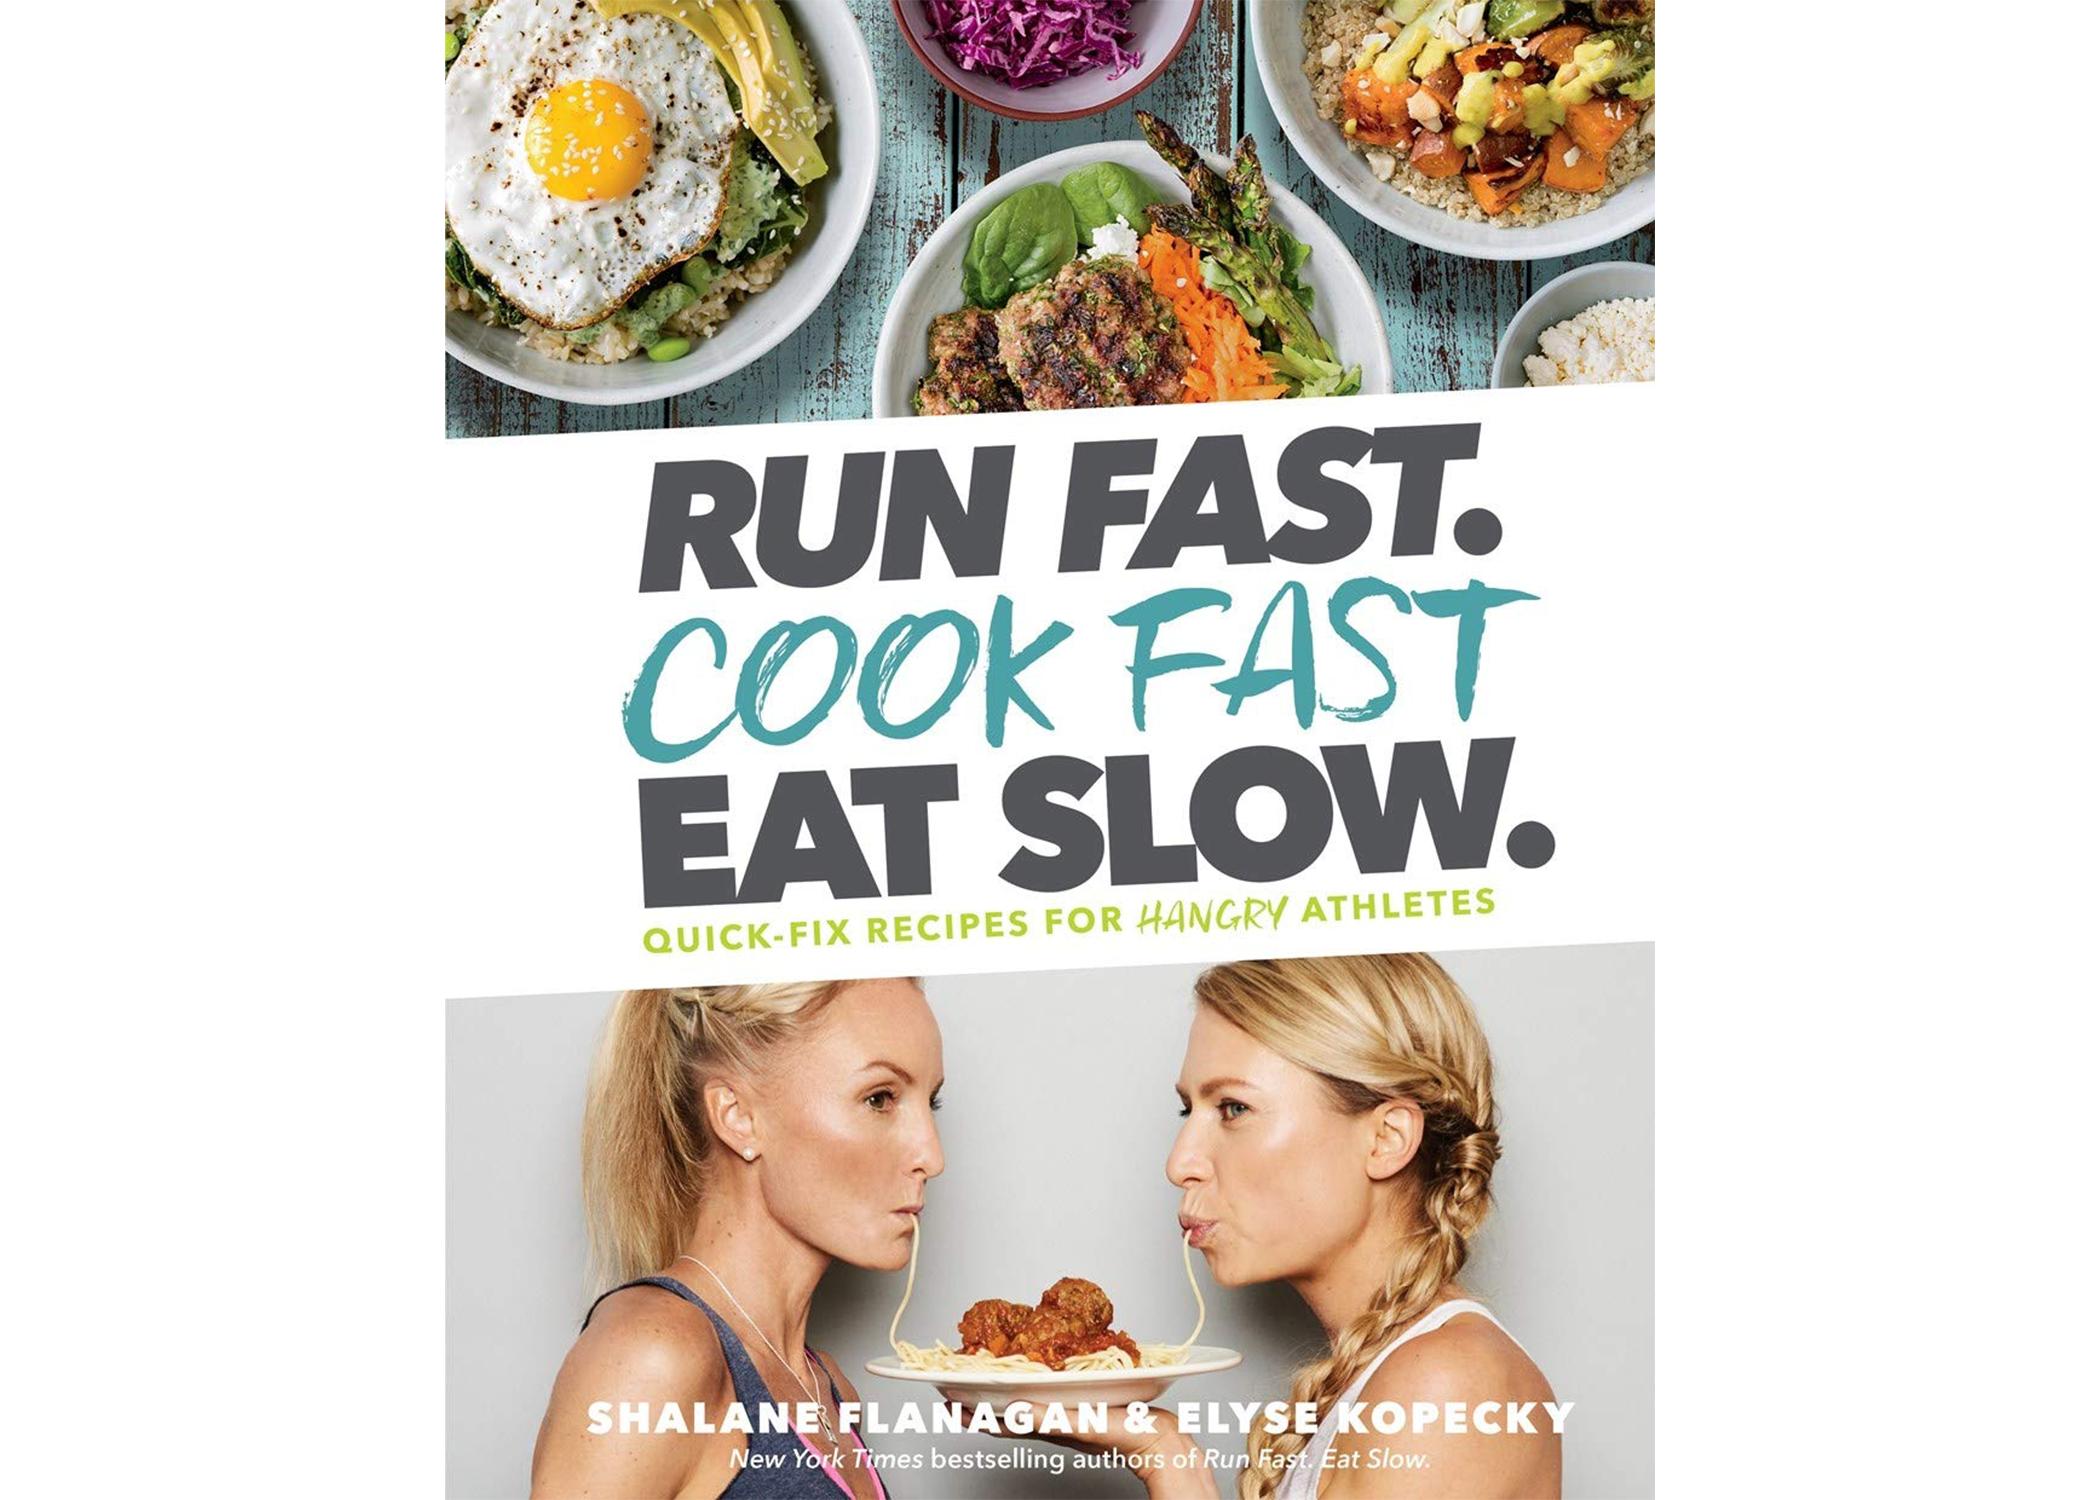 run fast cook fast eat slow.jpg